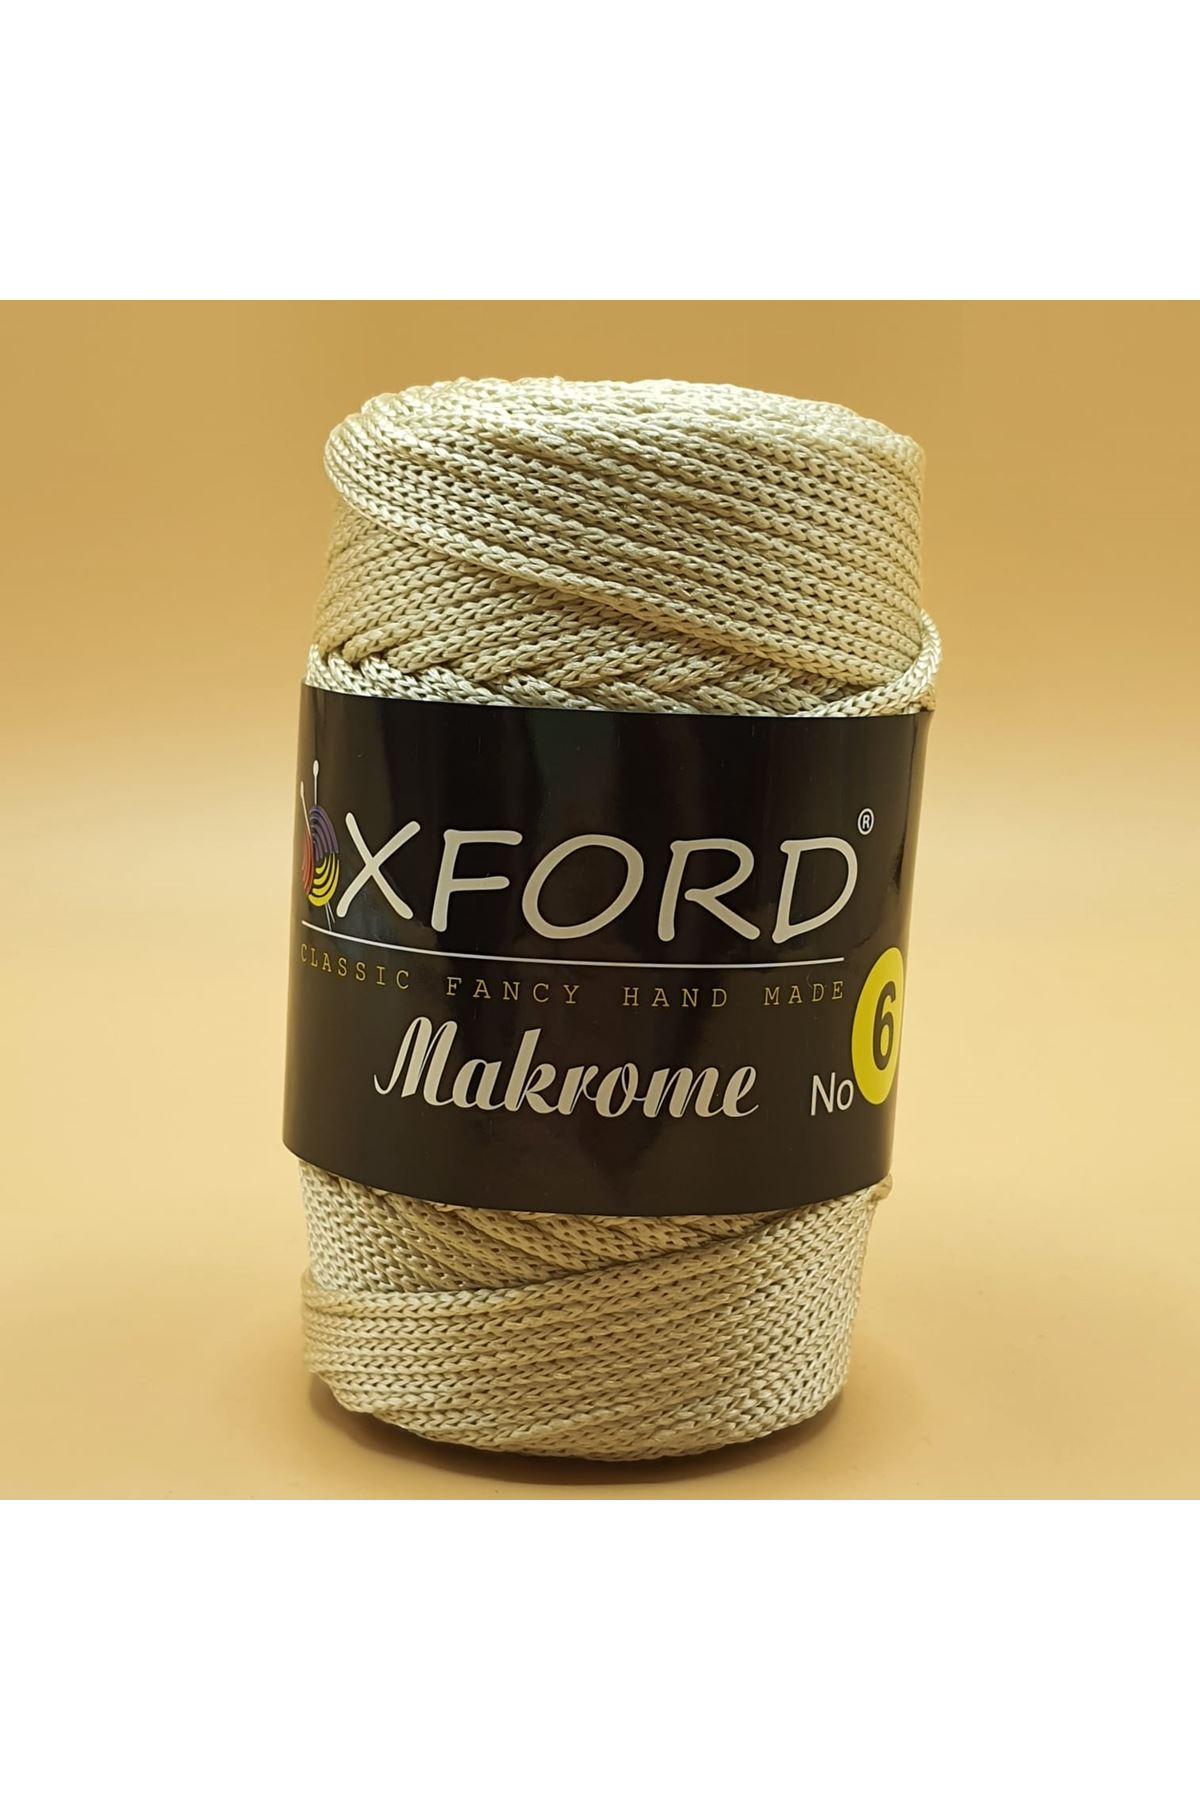 Oxford 6 No Makrome - 108 Kum